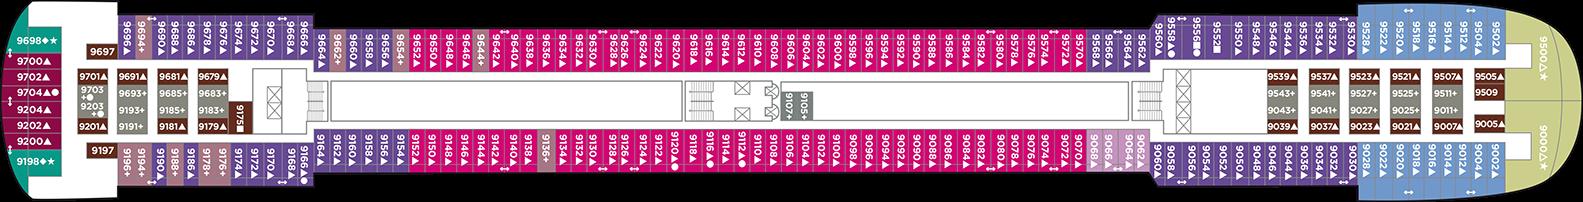 Norwegian Cruise Line Pride of America Deck Plans Deck 9.png